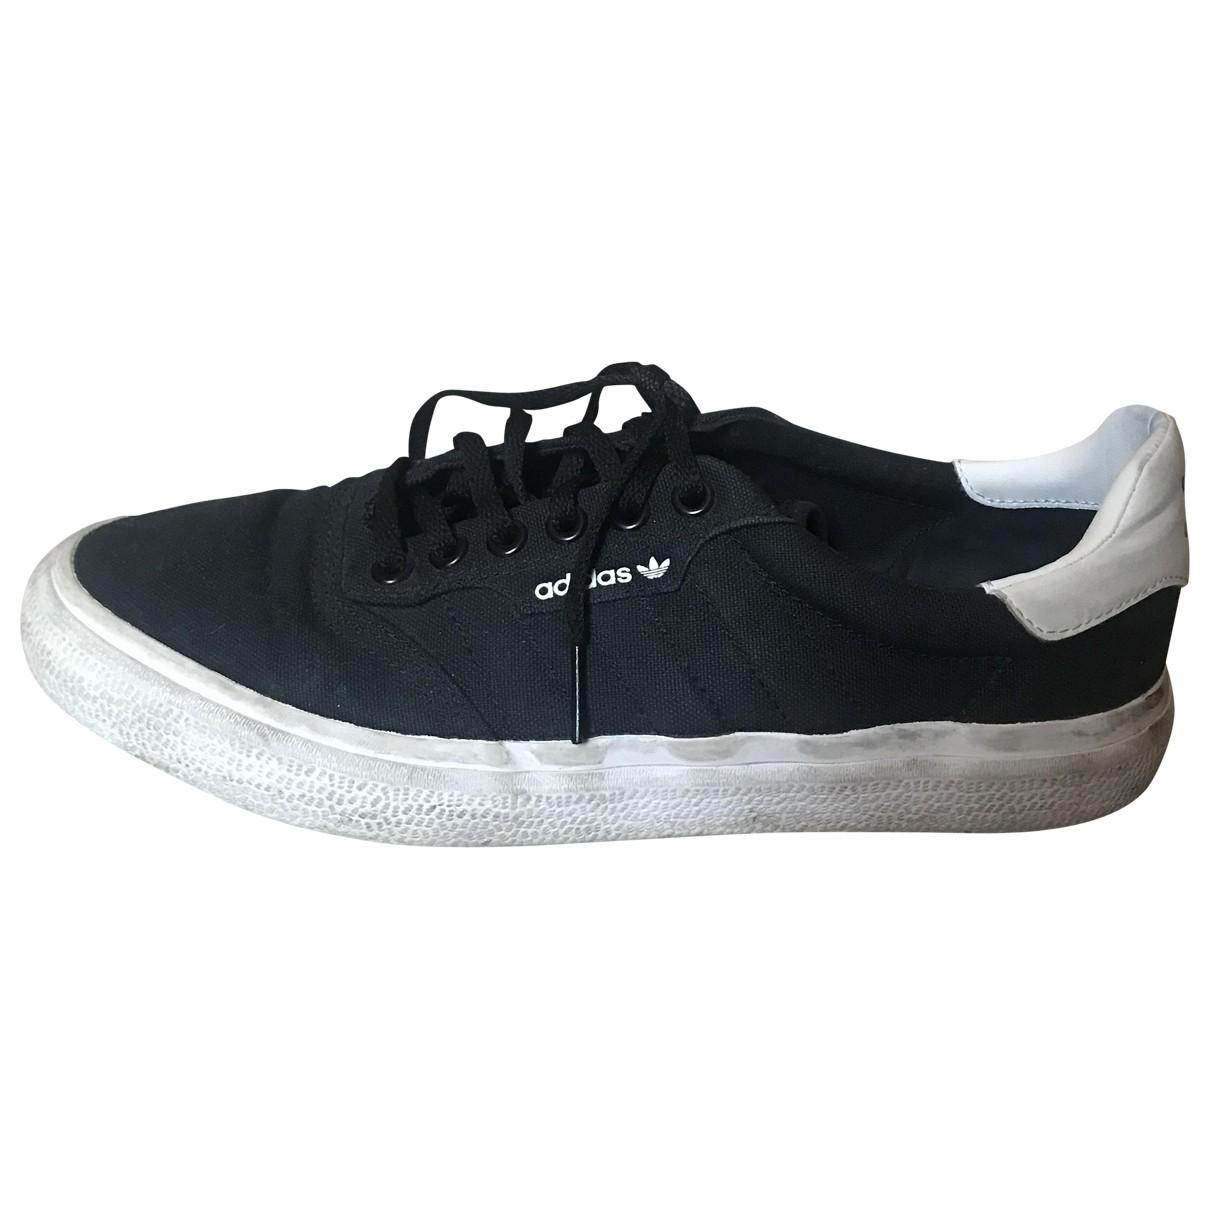 Adidas \N Black Cloth Trainers for Women 41.5 EU